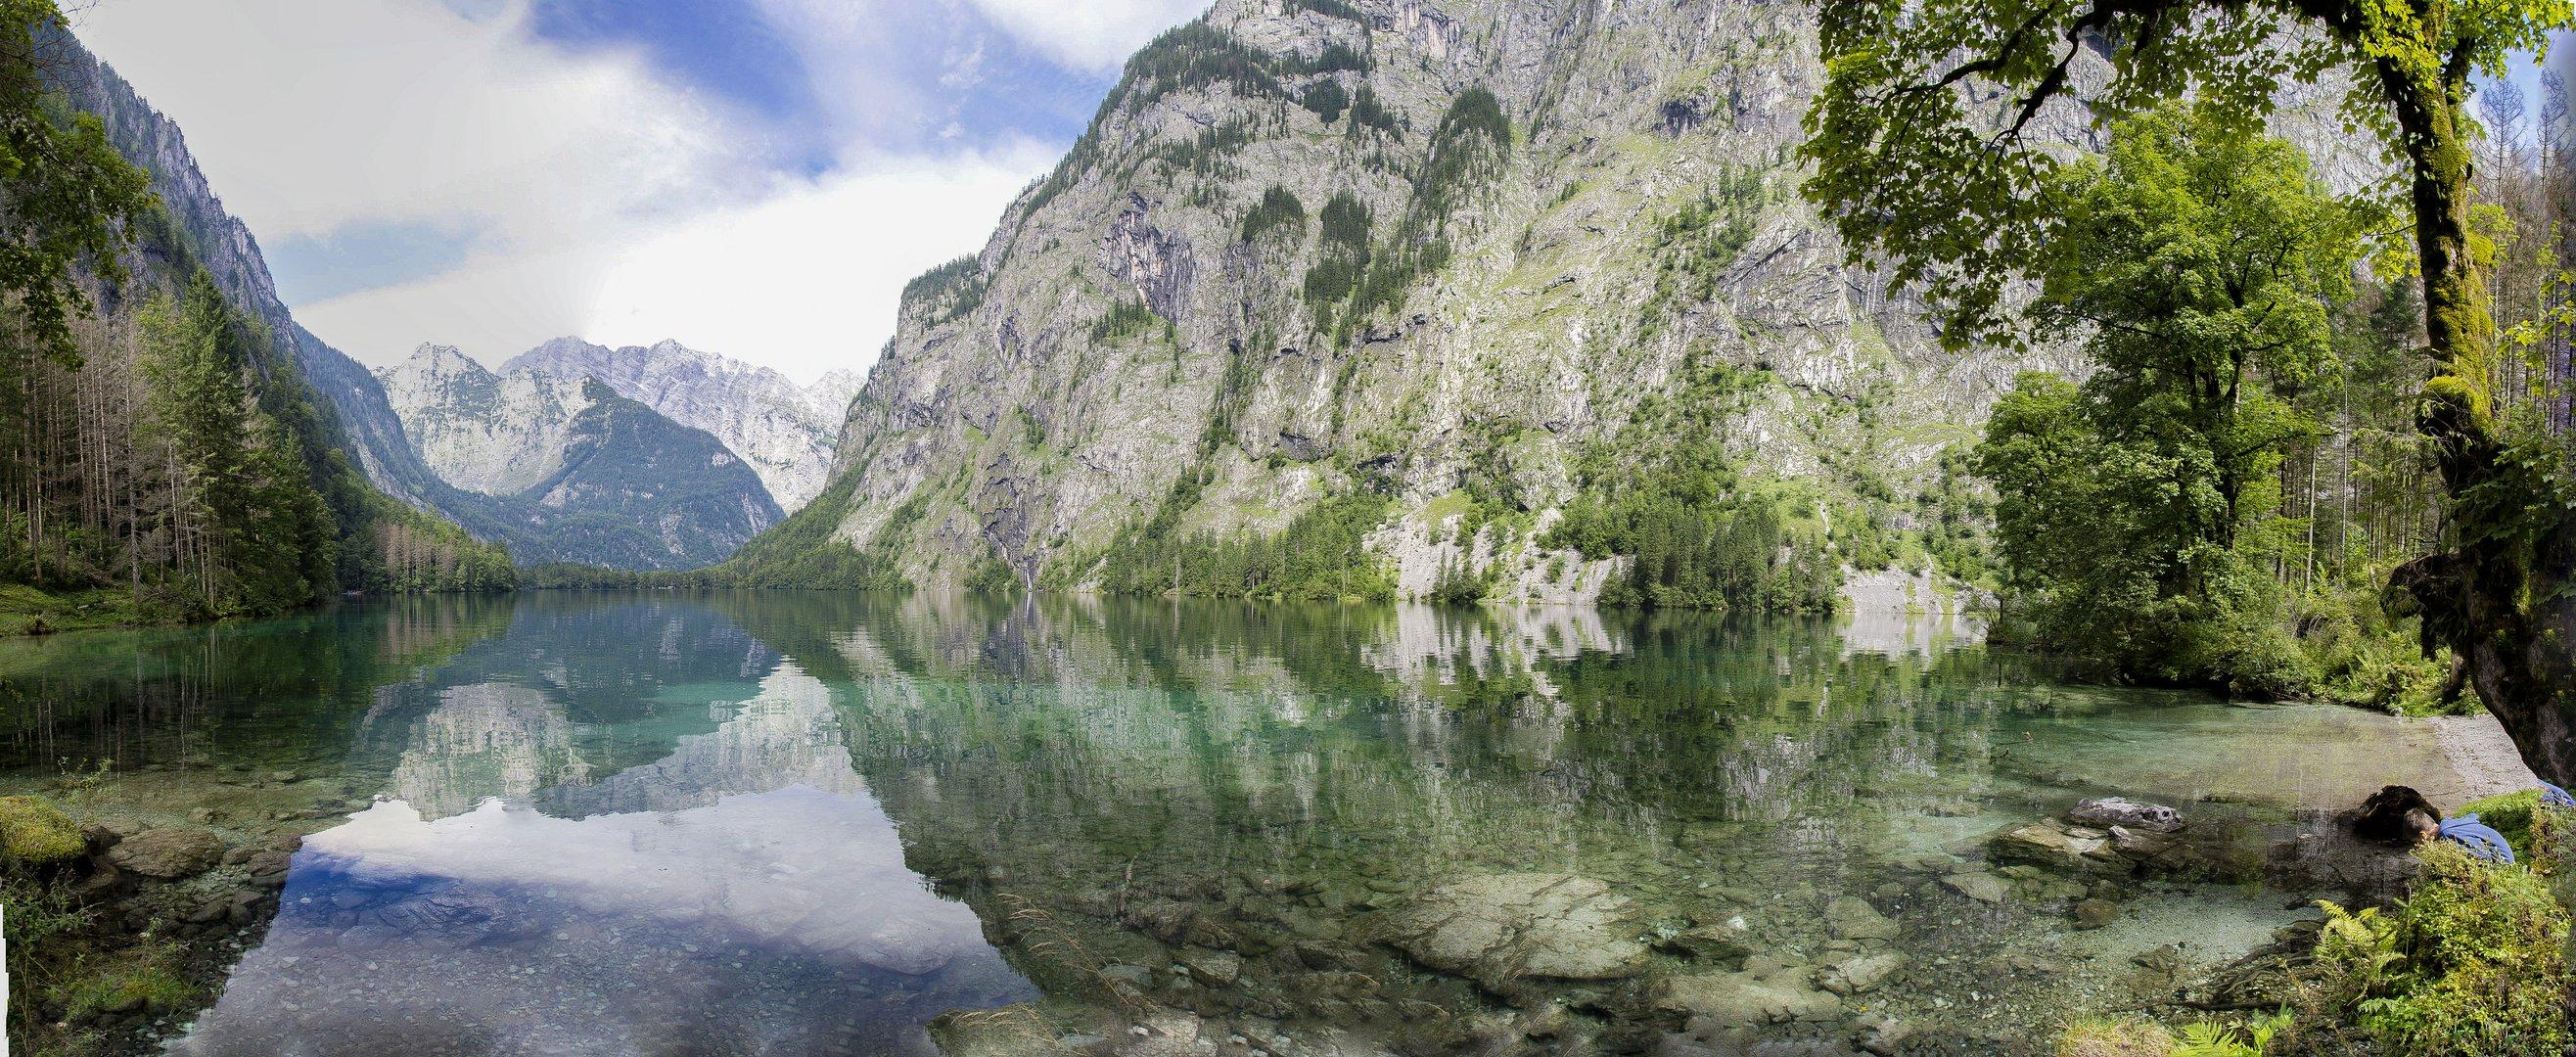 Obersee Berchtesgaden Panorama